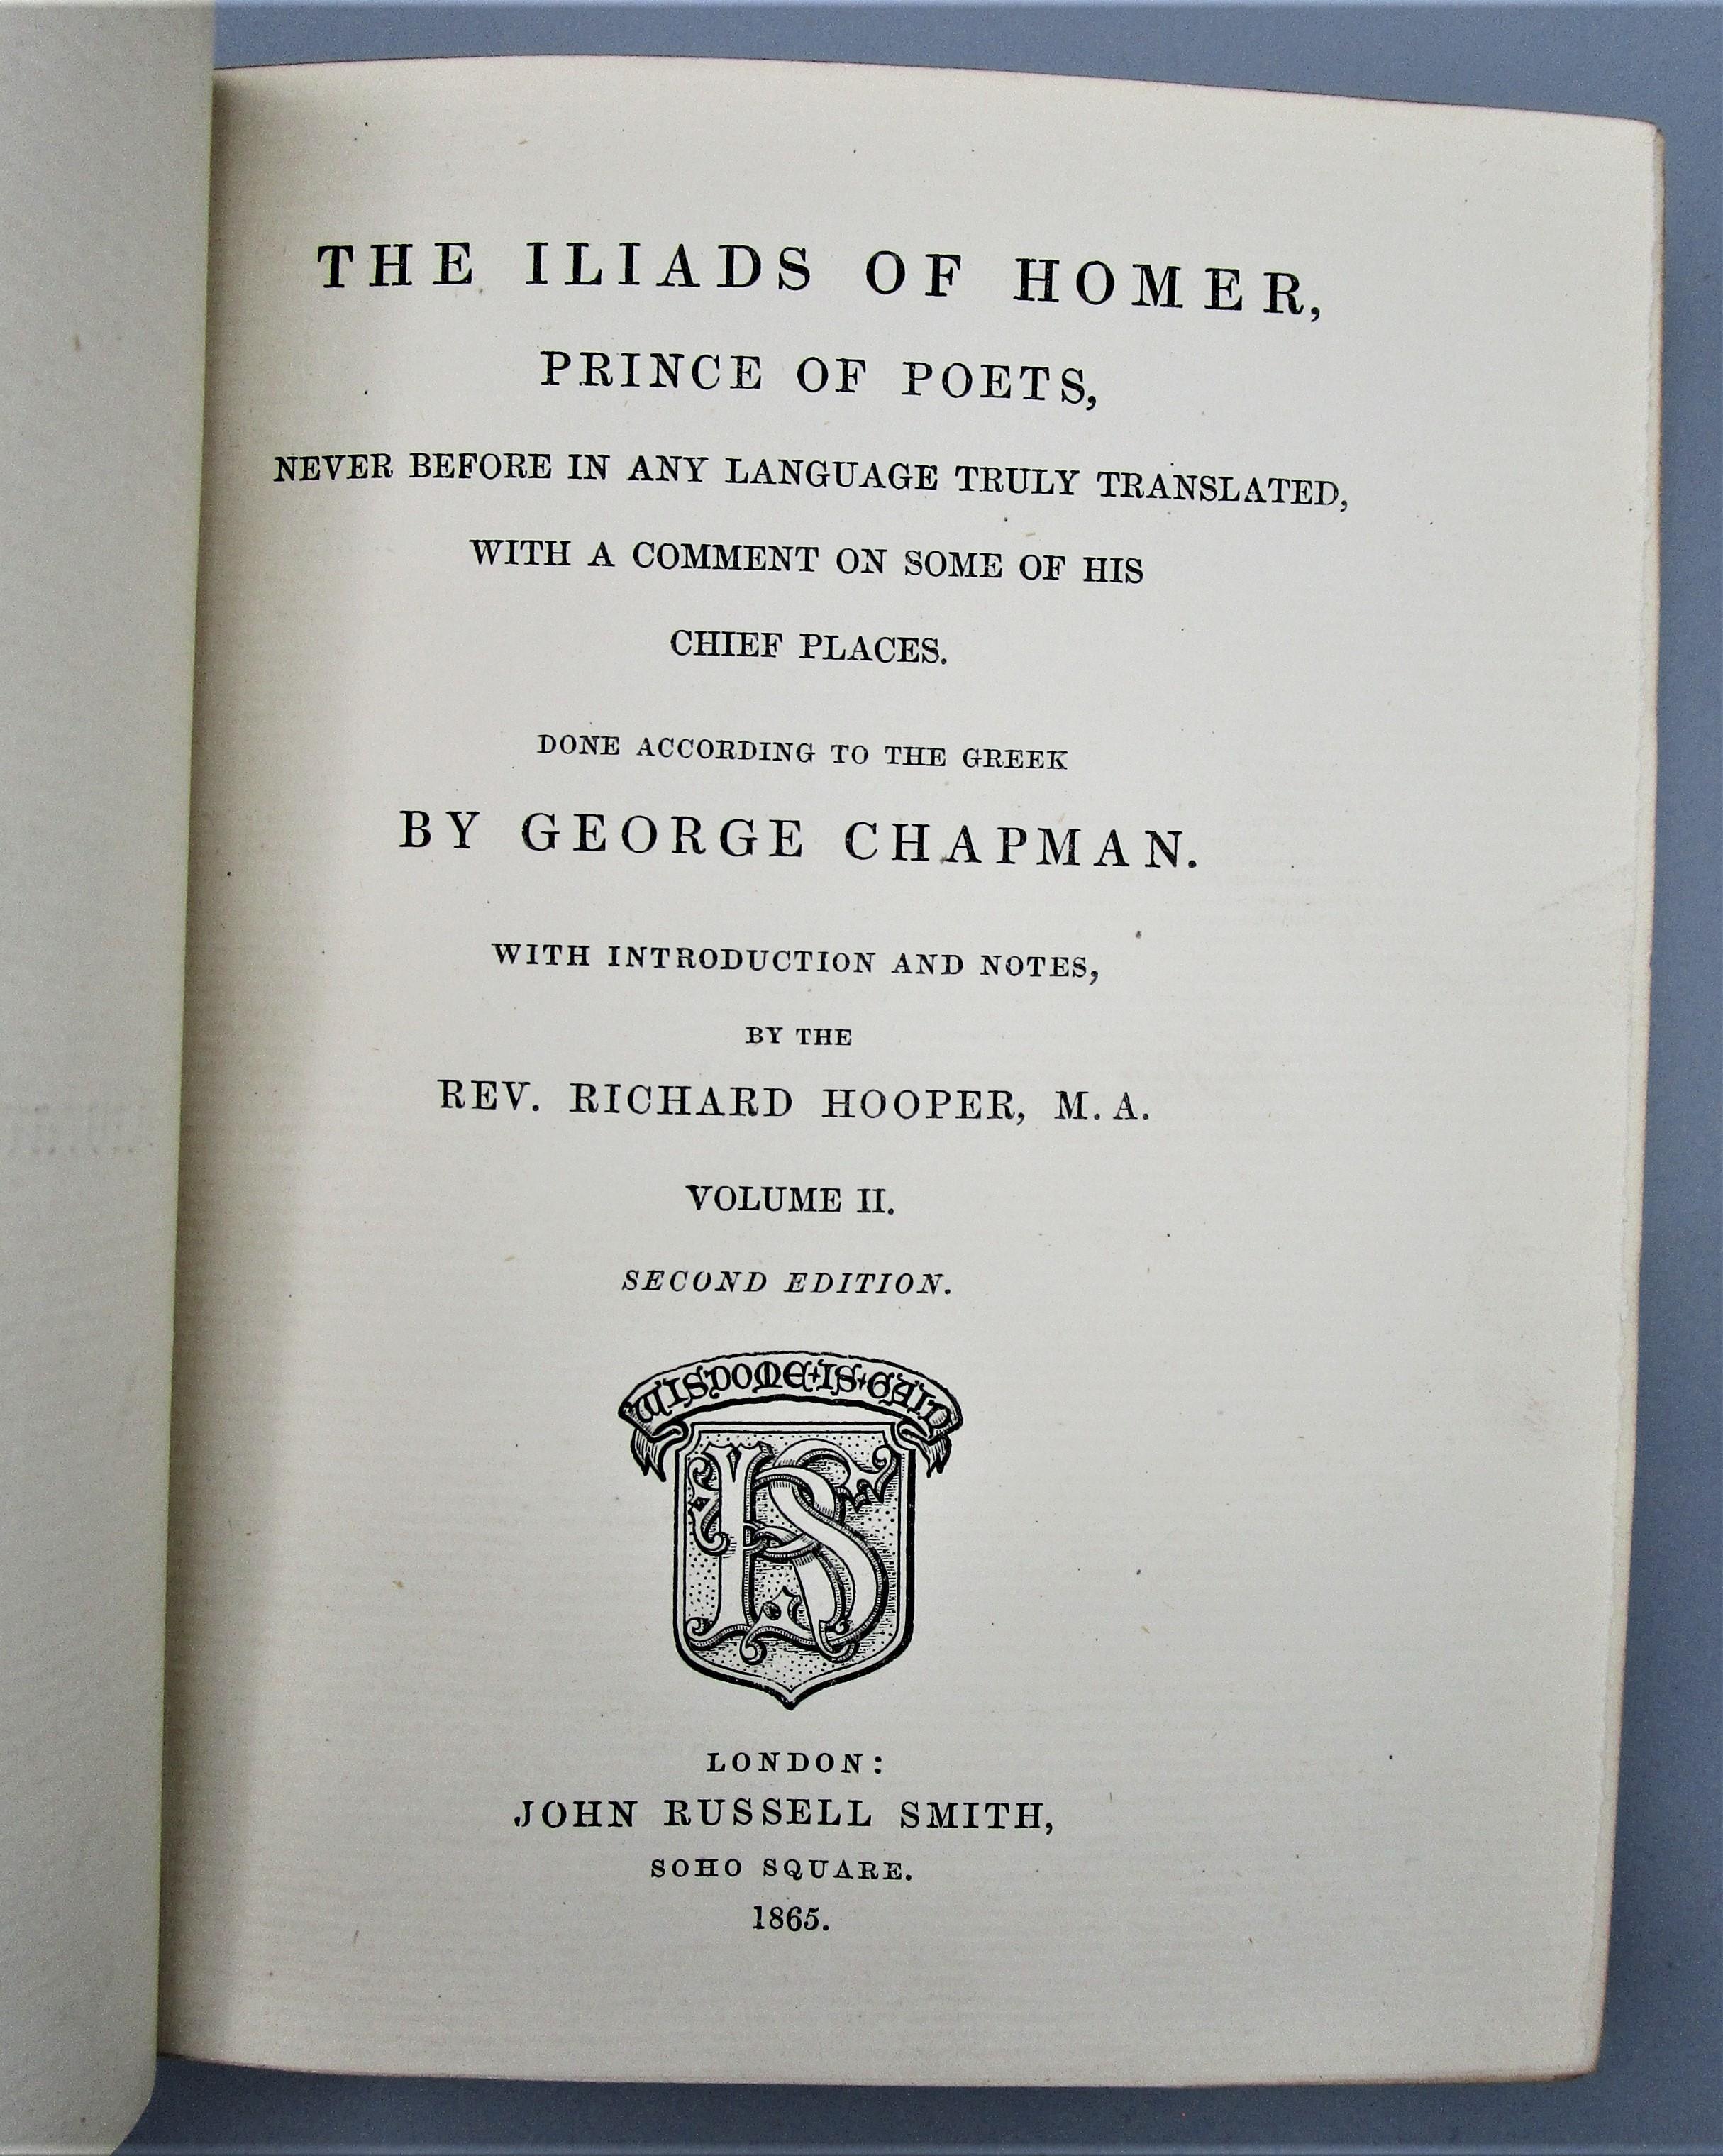 HOMER'S ODYSSEY & ILIAD, by George Chapman - 1857-65 [4 Vols]